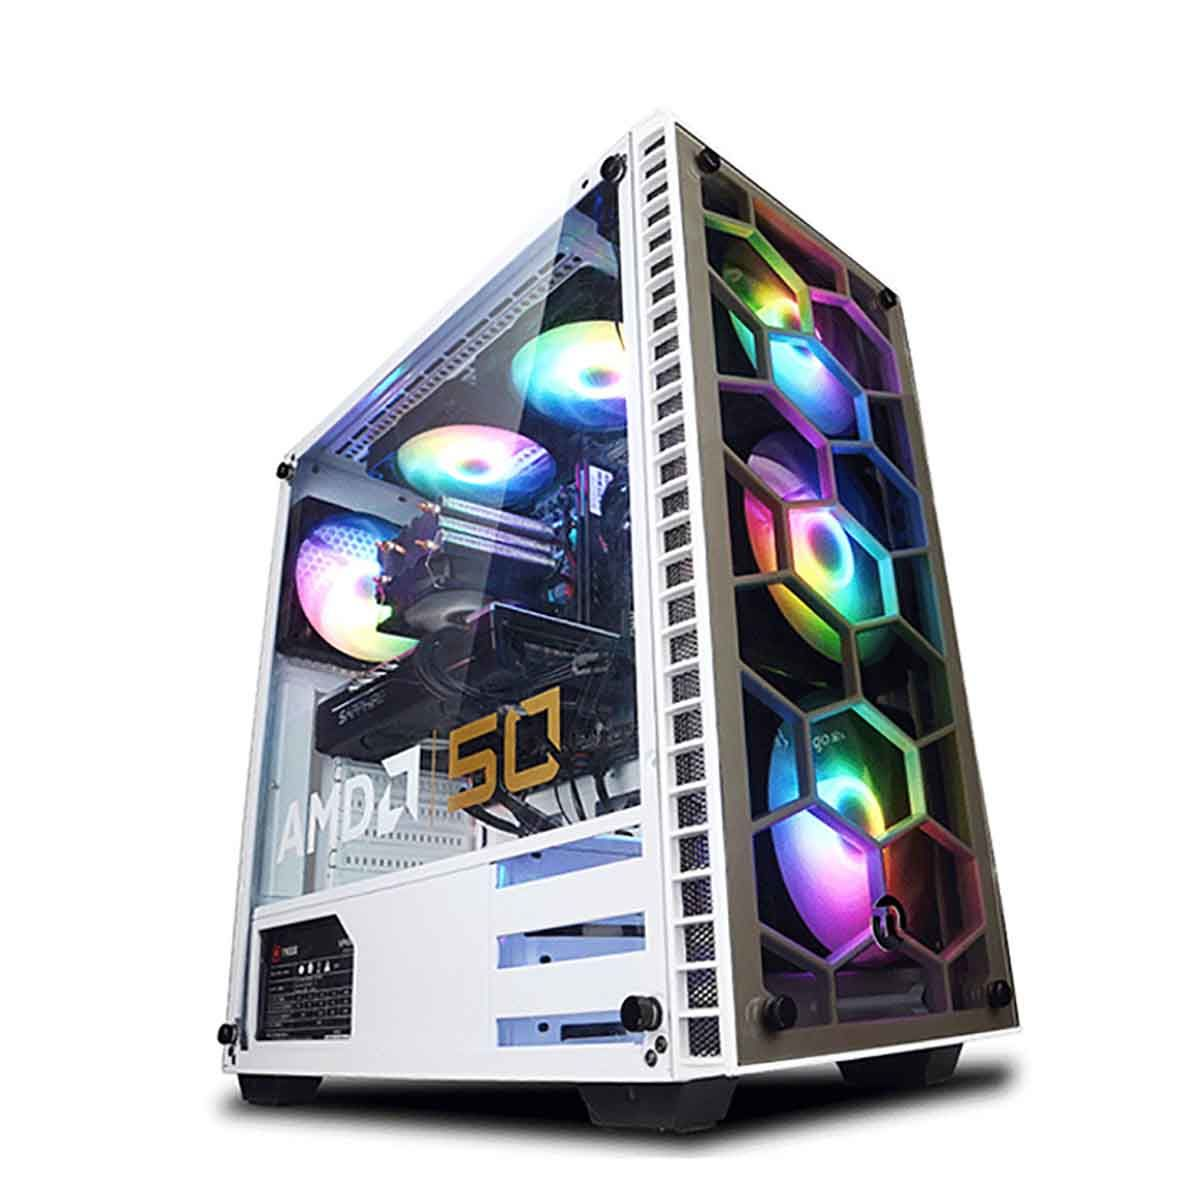 AMD銳龍R5 2600/GTX1650昇1660遊戲主機高配吃雞電腦臺式組裝整機